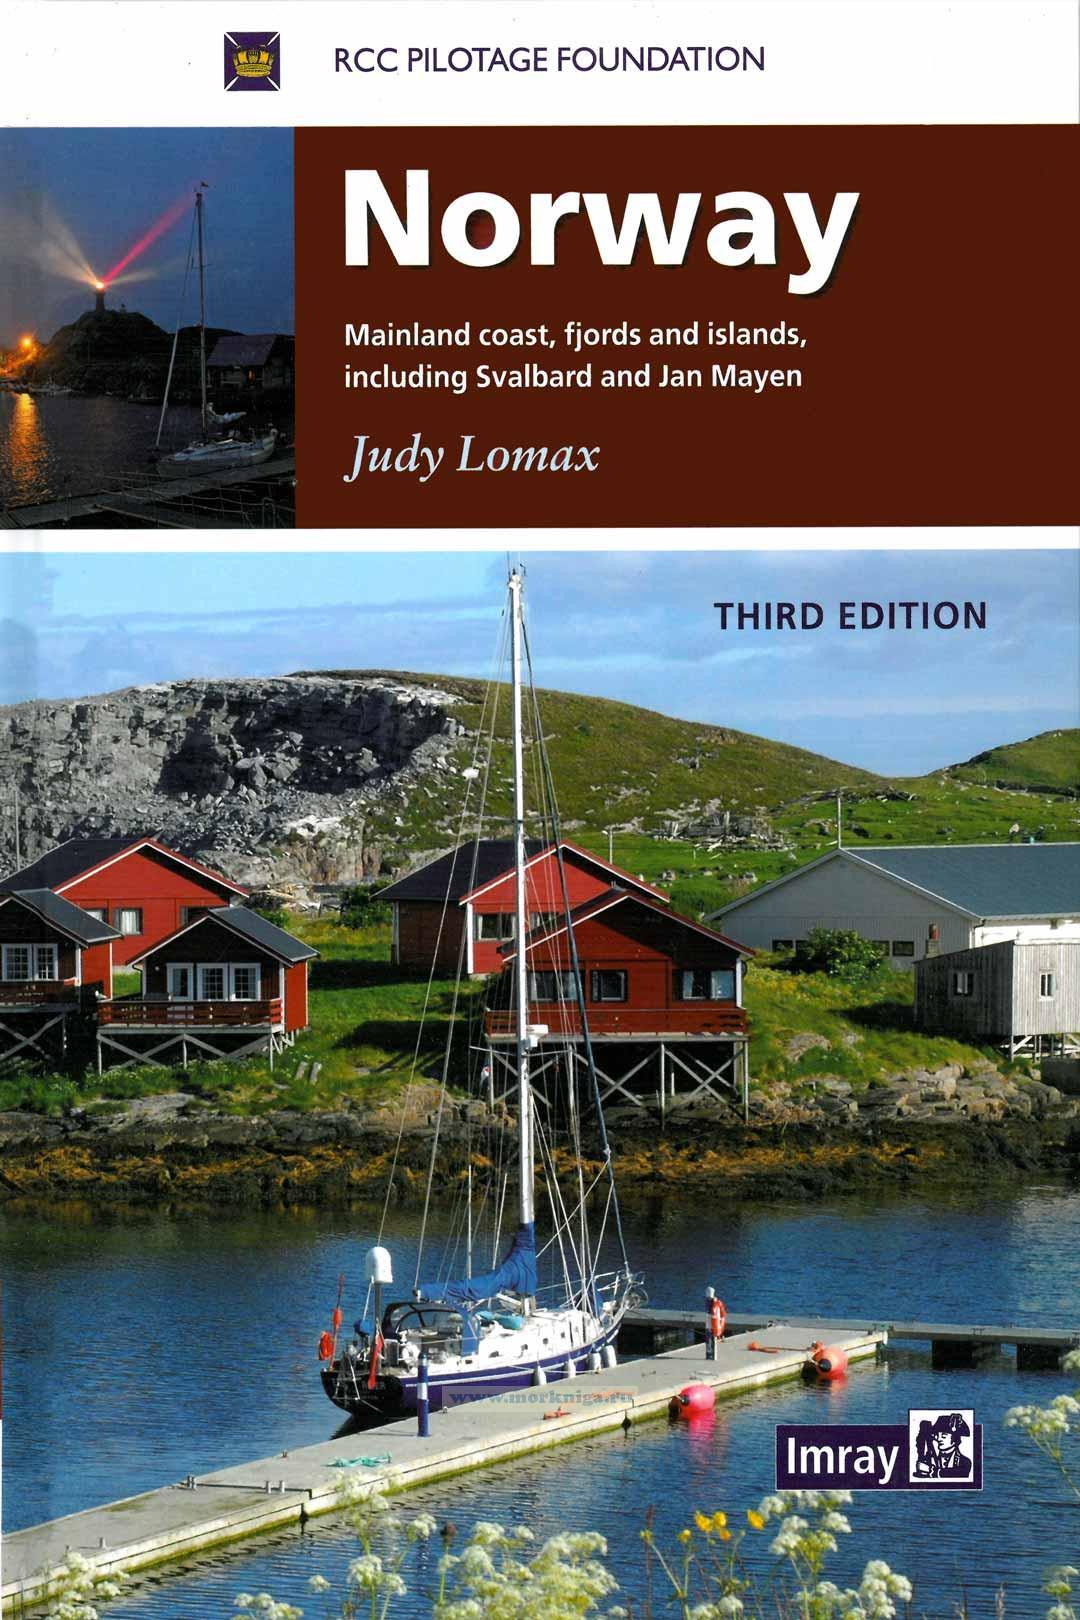 Norway Норвегия. Материковое побережье, фьорды и острова, включая Шпицберген и Ян-Майен 3е издание